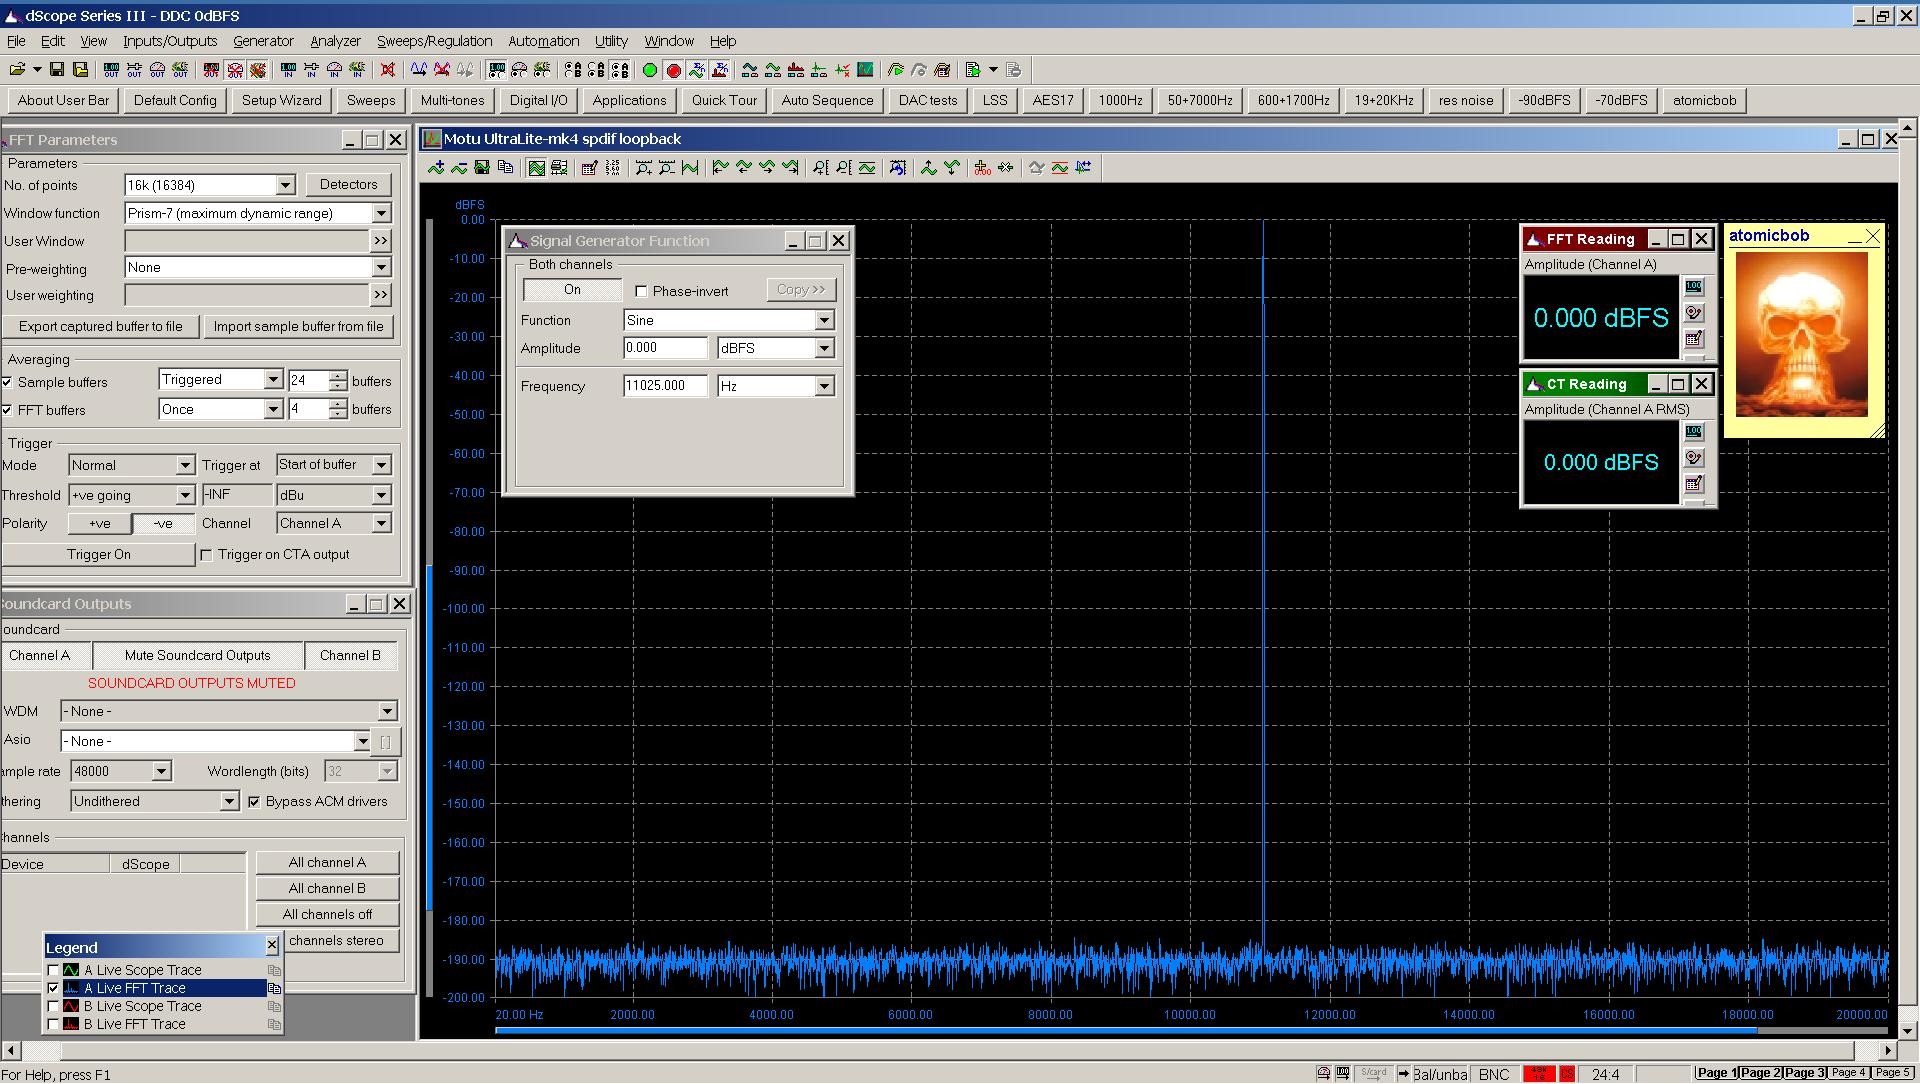 20200606 UltraLite-mk4 spdif loopback 0dBFS FFT 200 dB scale.png